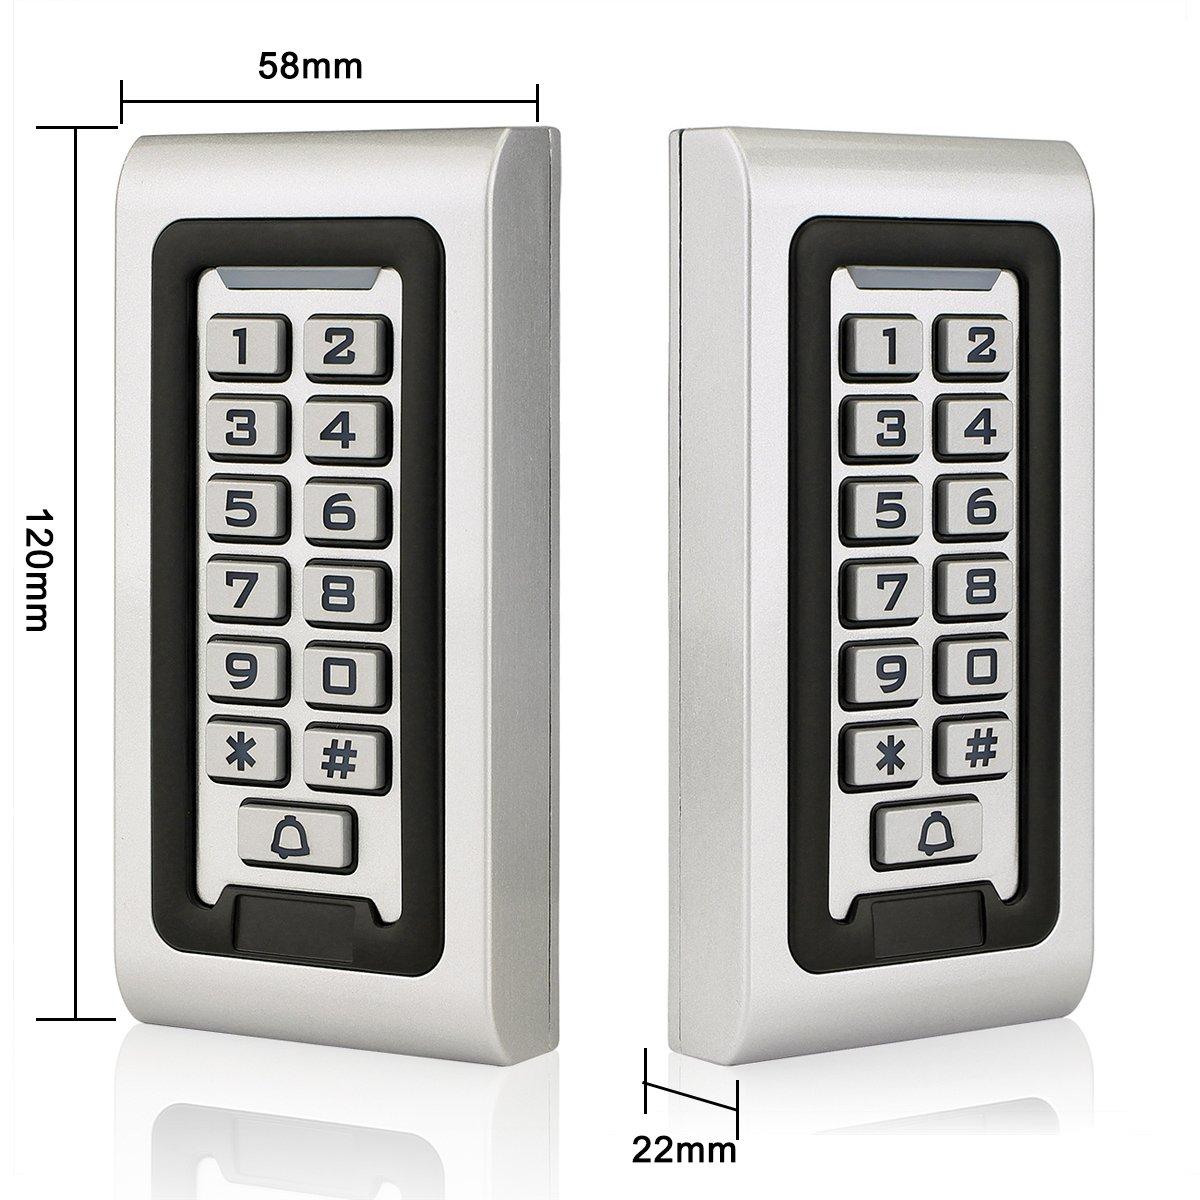 Retekess S601EM-W Codeschloss PIN-Code RFID-Karte IP68 f/ür Fabrik Silber